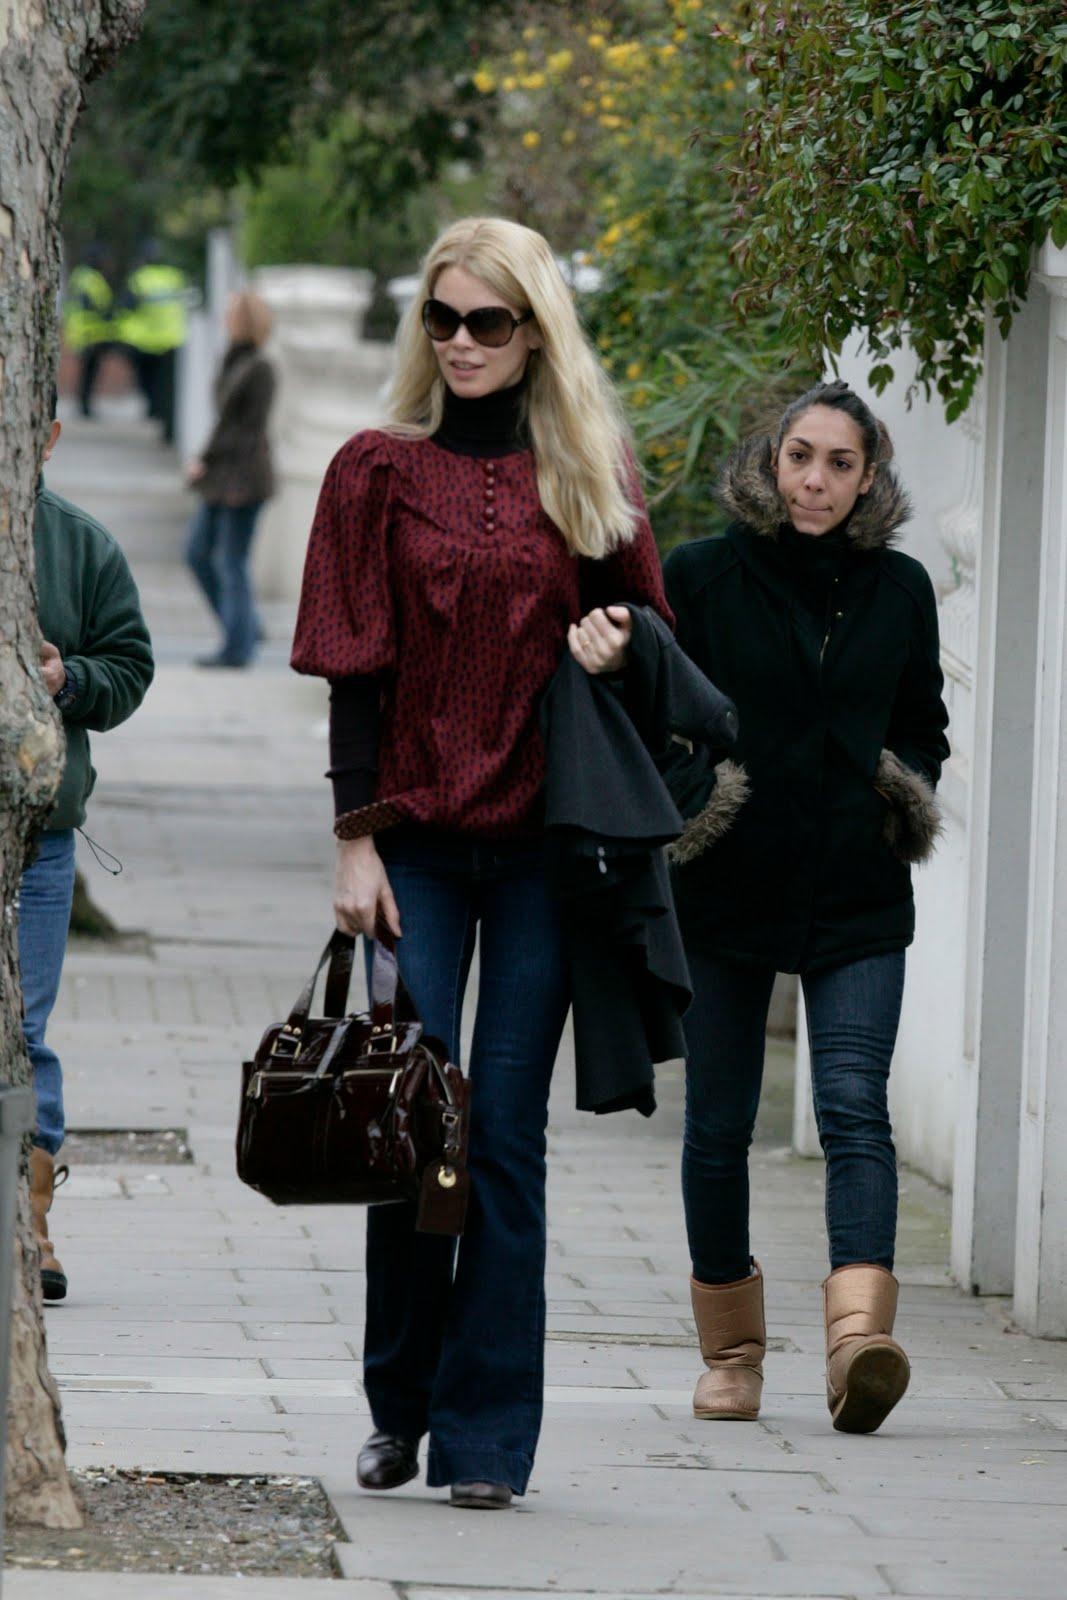 http://3.bp.blogspot.com/_pB39VNVB0Wk/S8n6AJpr9HI/AAAAAAAADX4/7Pt1mDyqa-I/s1600/80118_Celebutopia-Claudia_Schiffer_walking_in_the_street_in_London-02_122_952lo.jpg